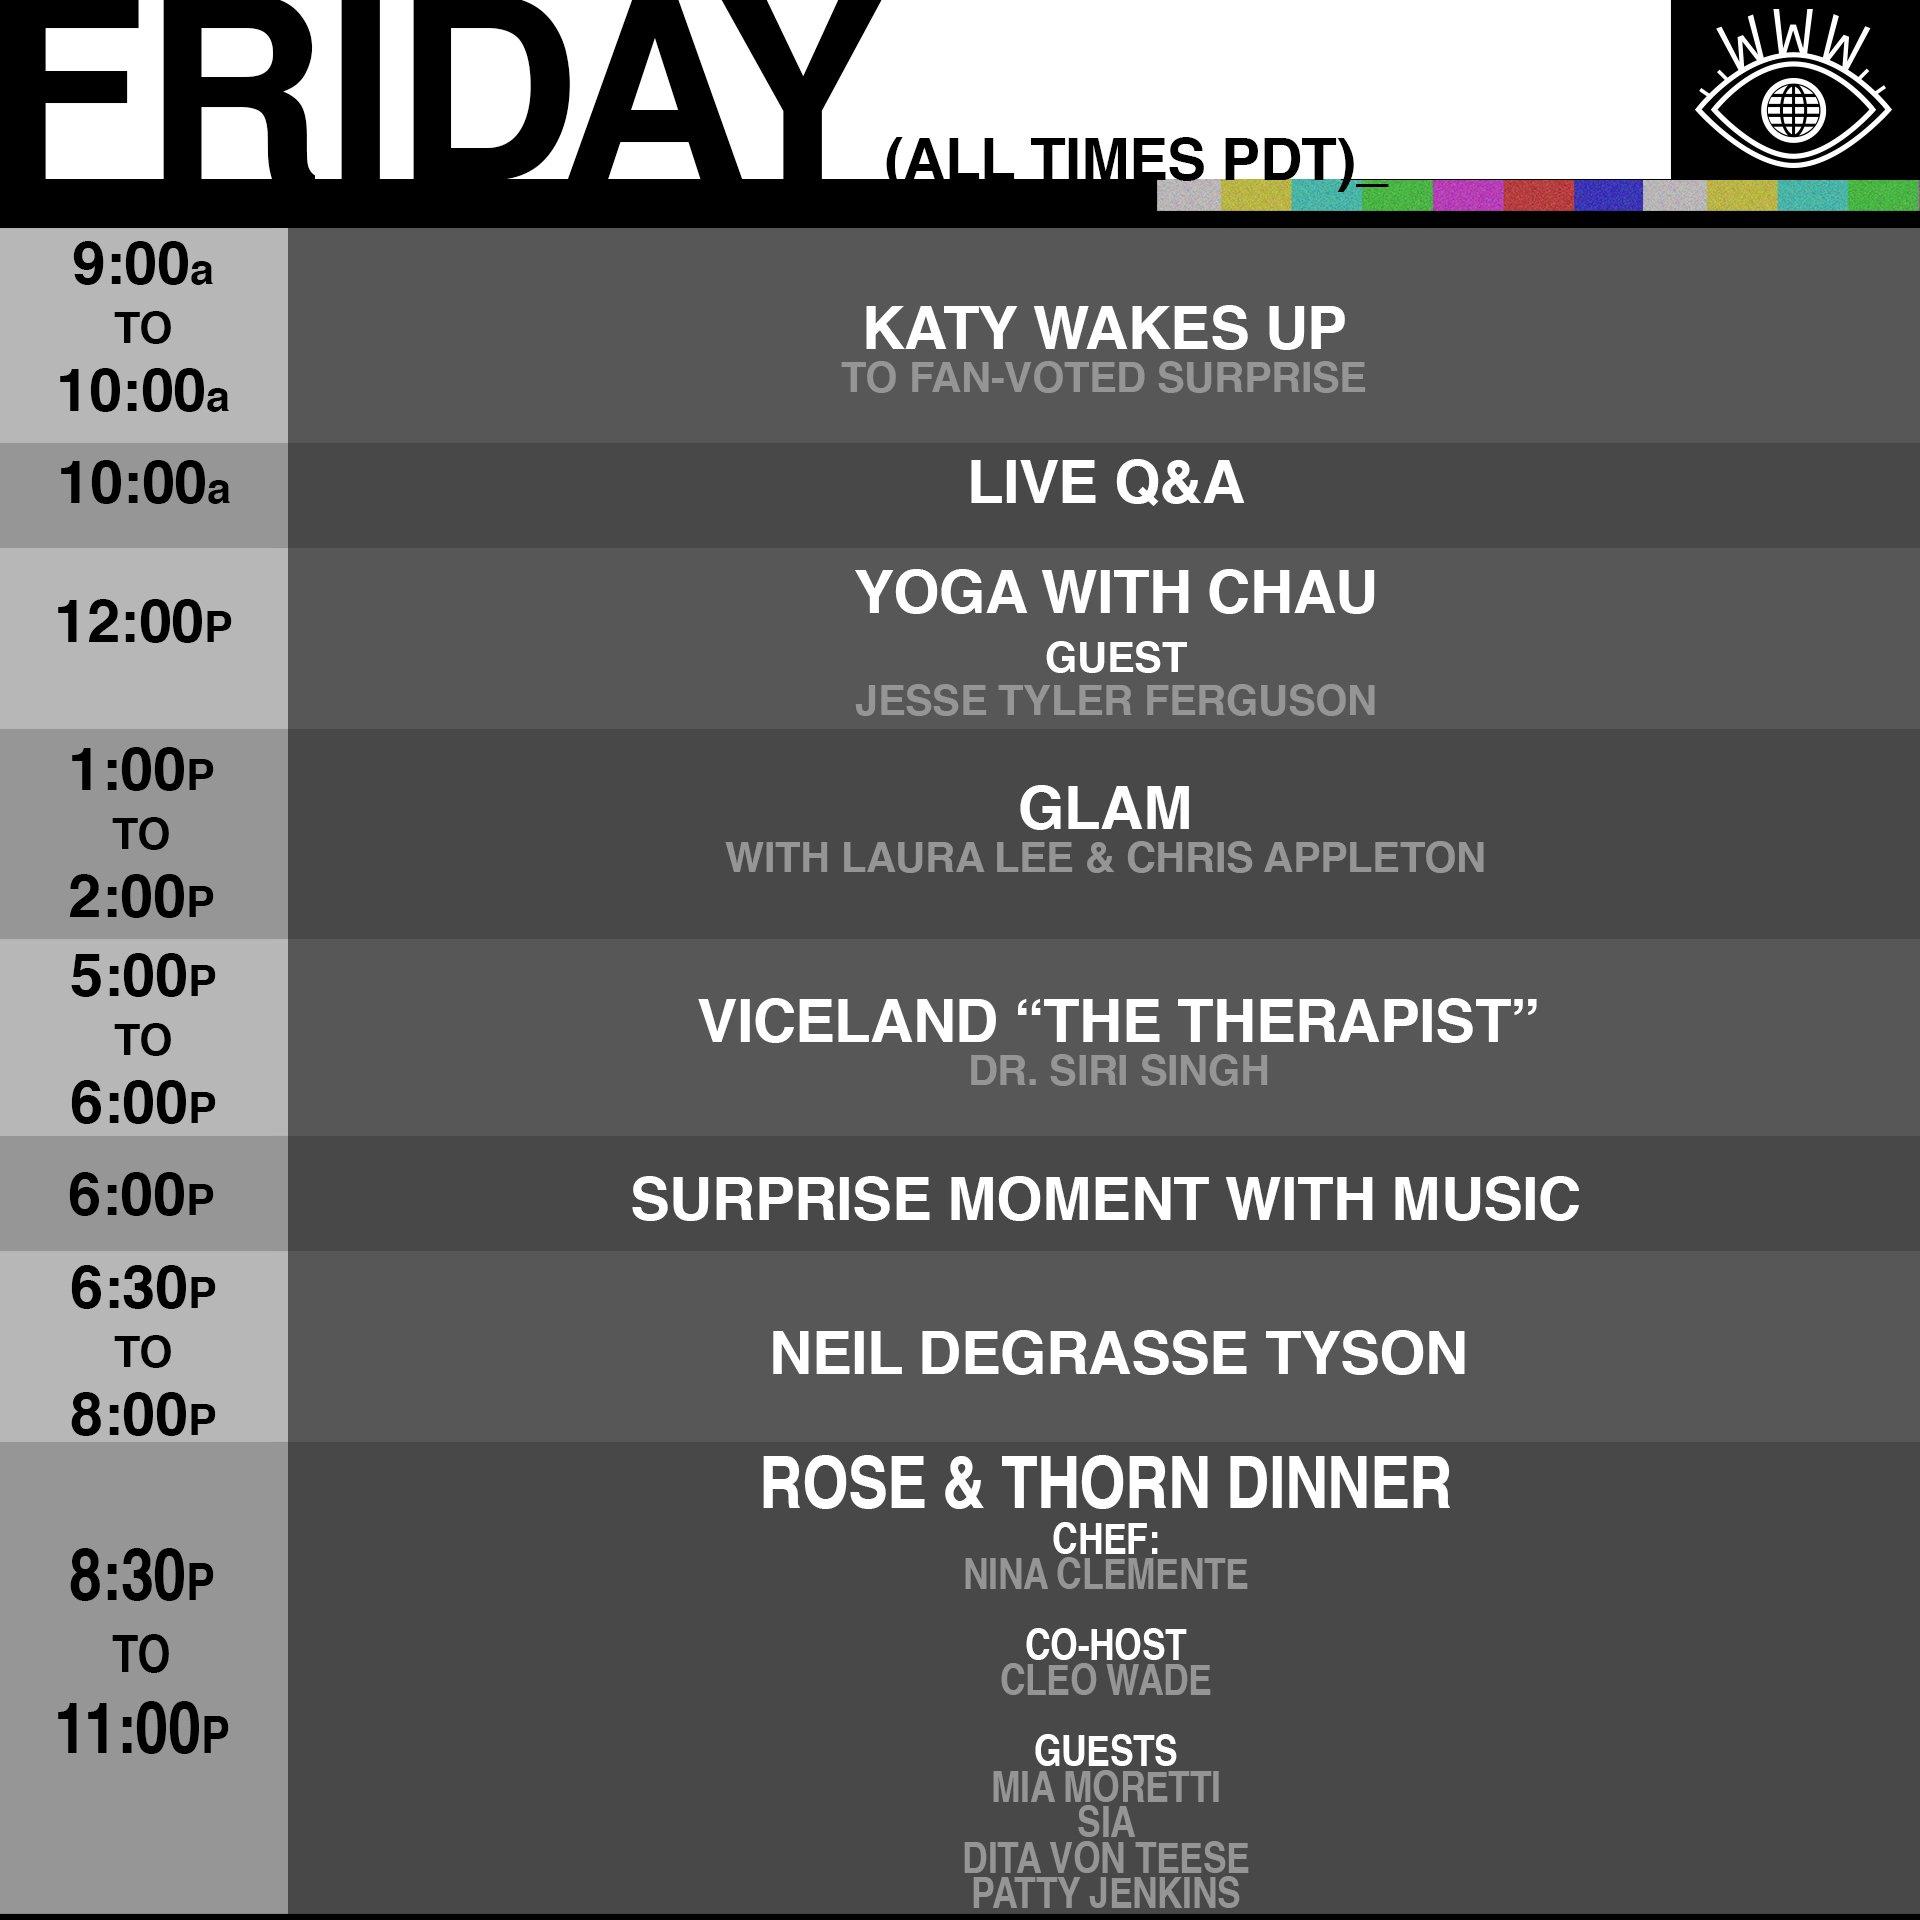 Today on #KPWWW https://t.co/EJOsFazFtu -Team Katy https://t.co/UBh9v7EEgL